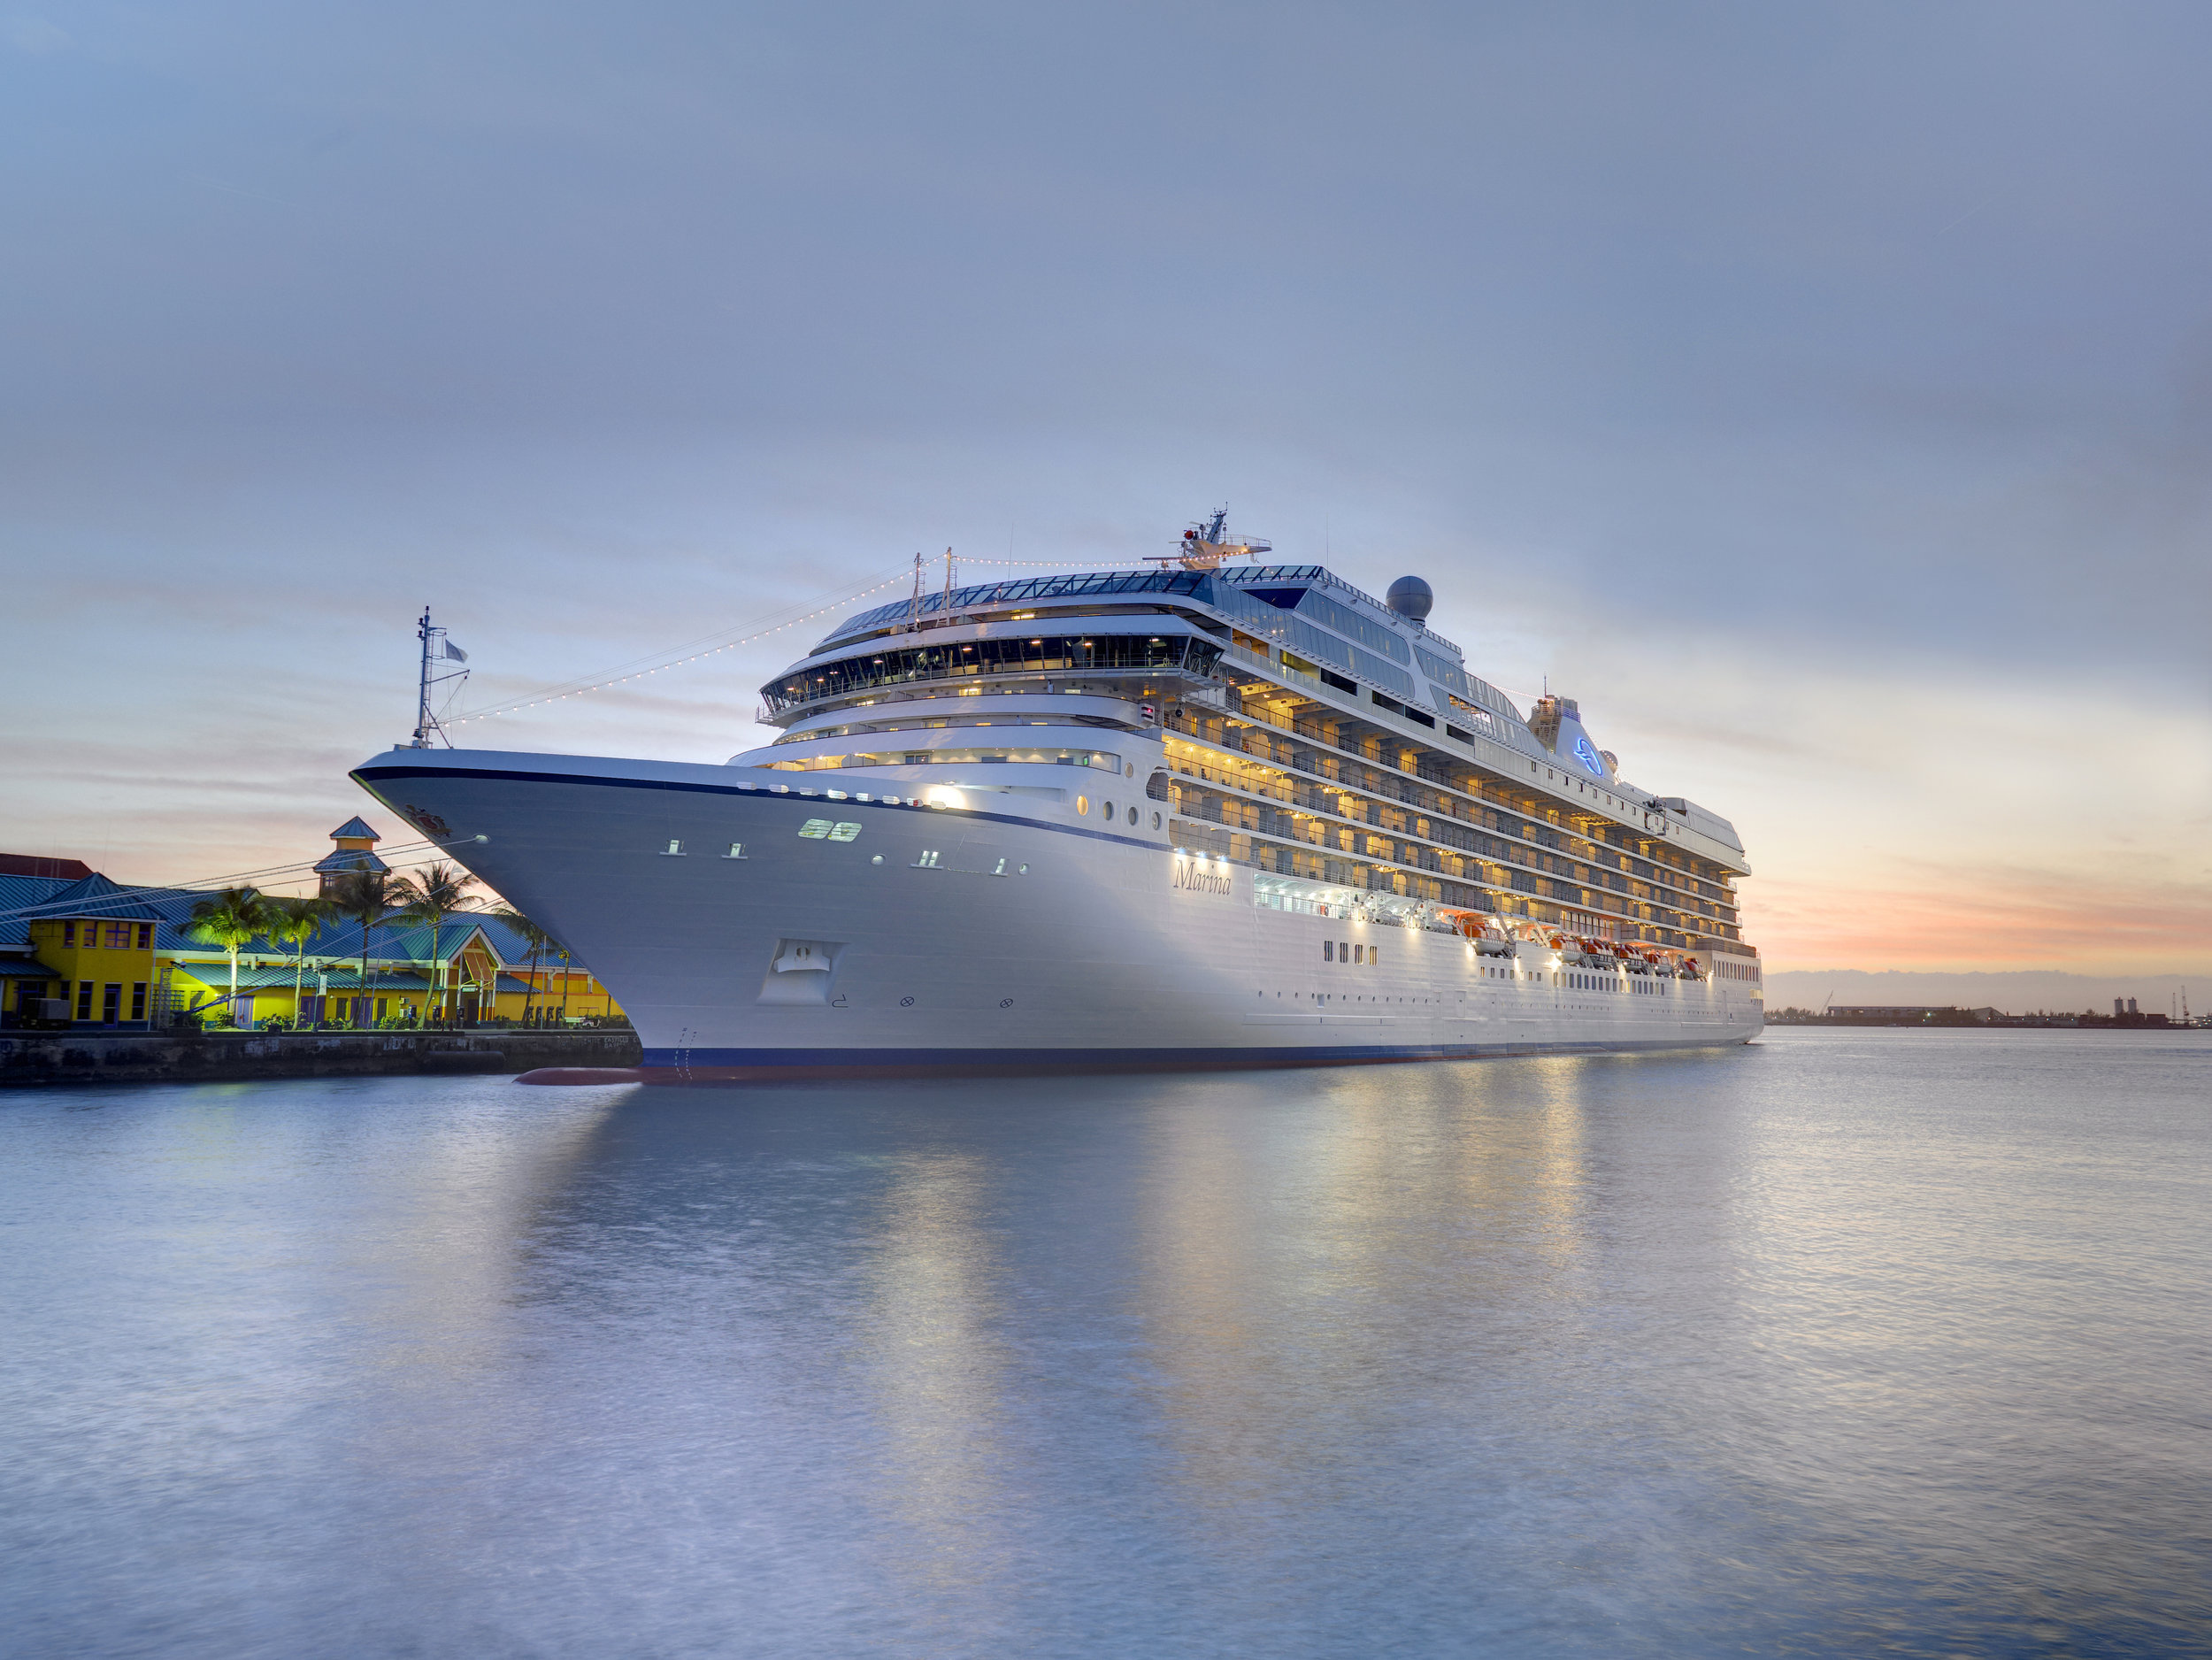 oClass-Marina-Nassau.jpg